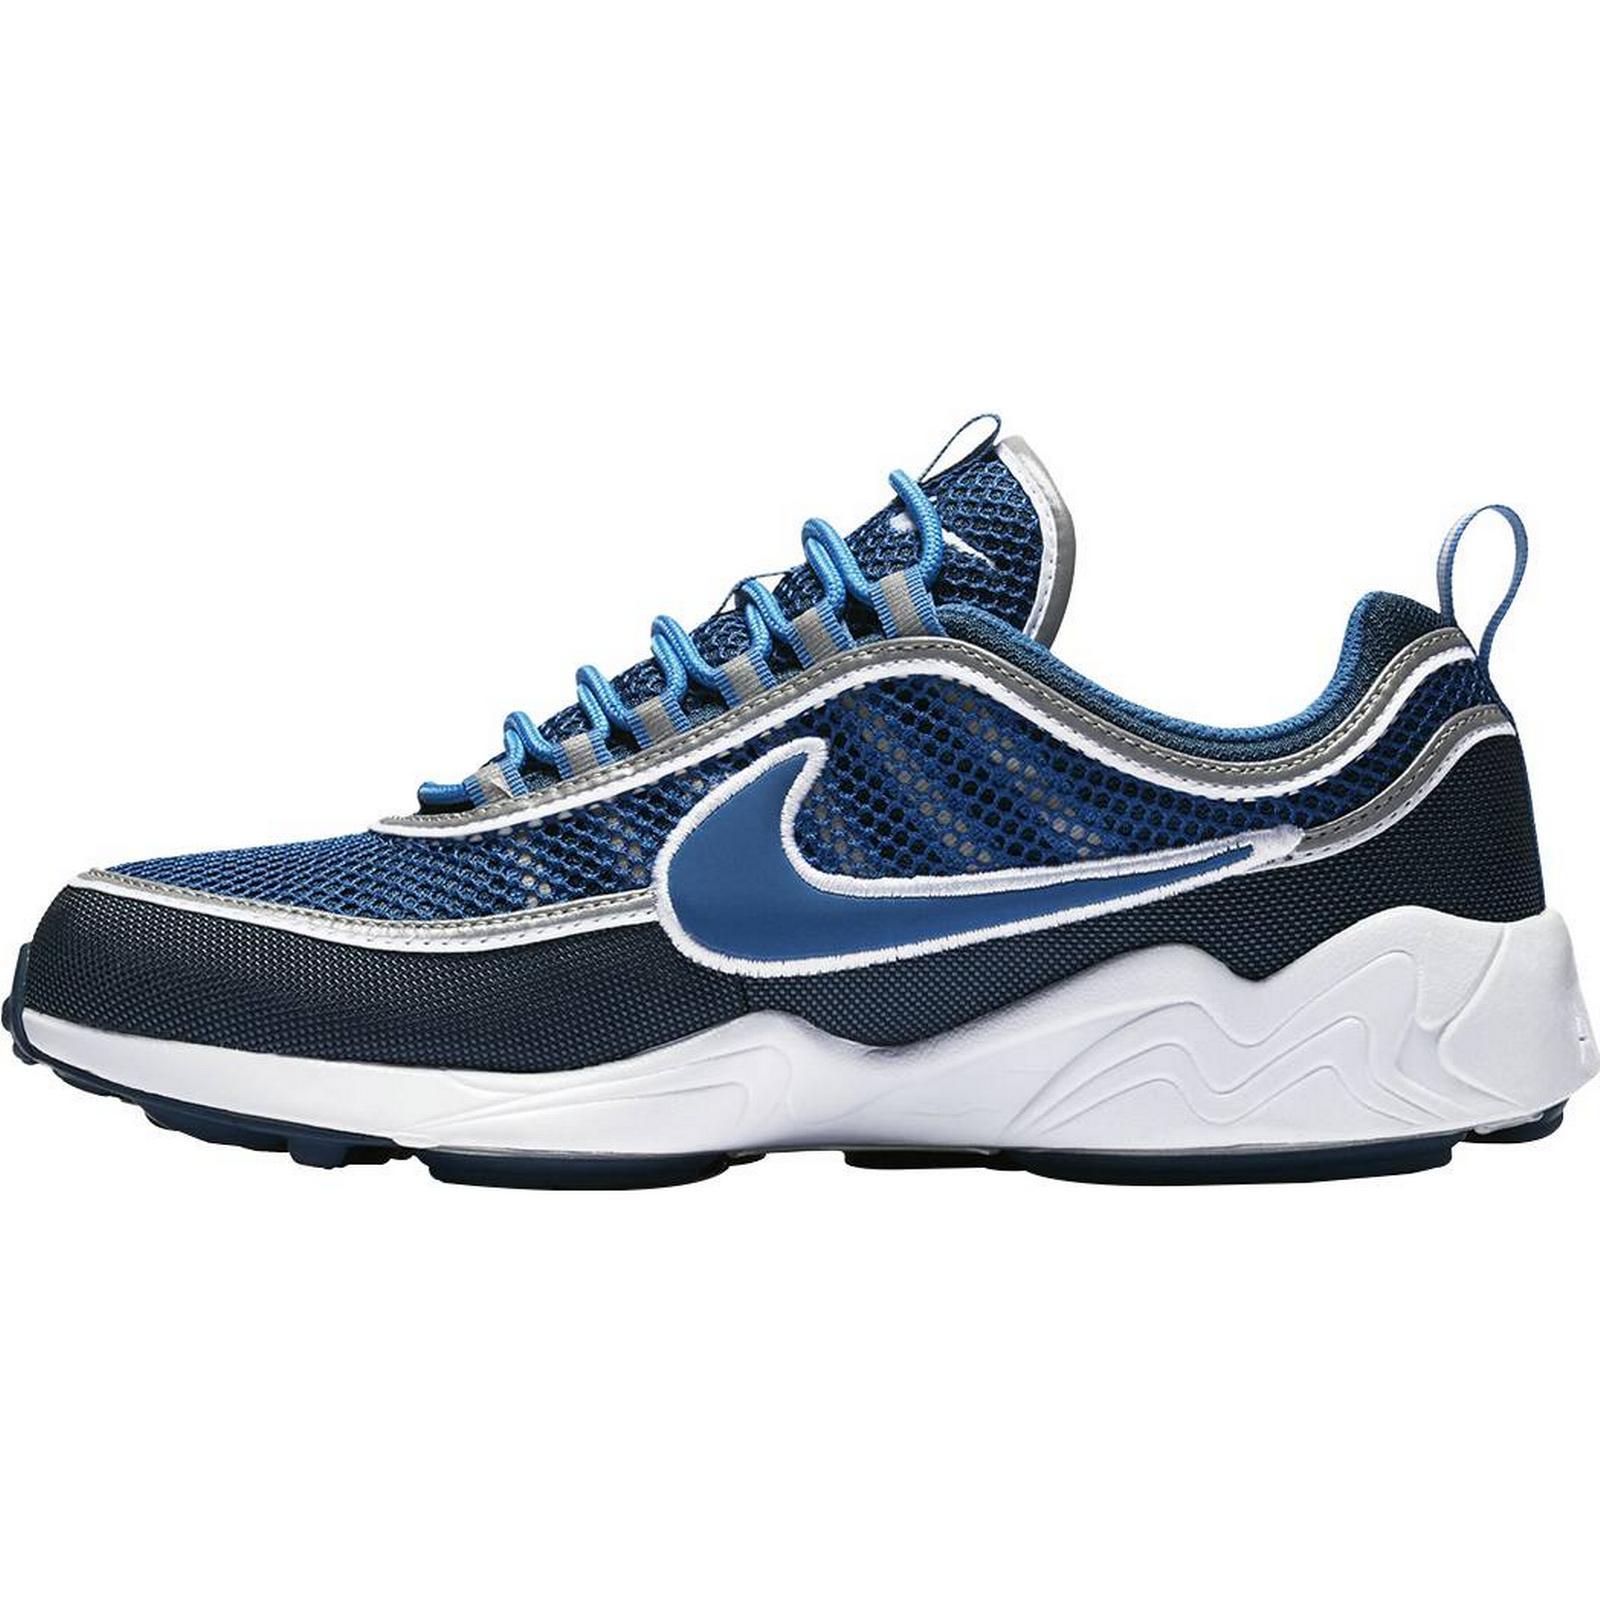 Nike - Air Zoom Spiridon '16 - Nike Blauw 228b9e